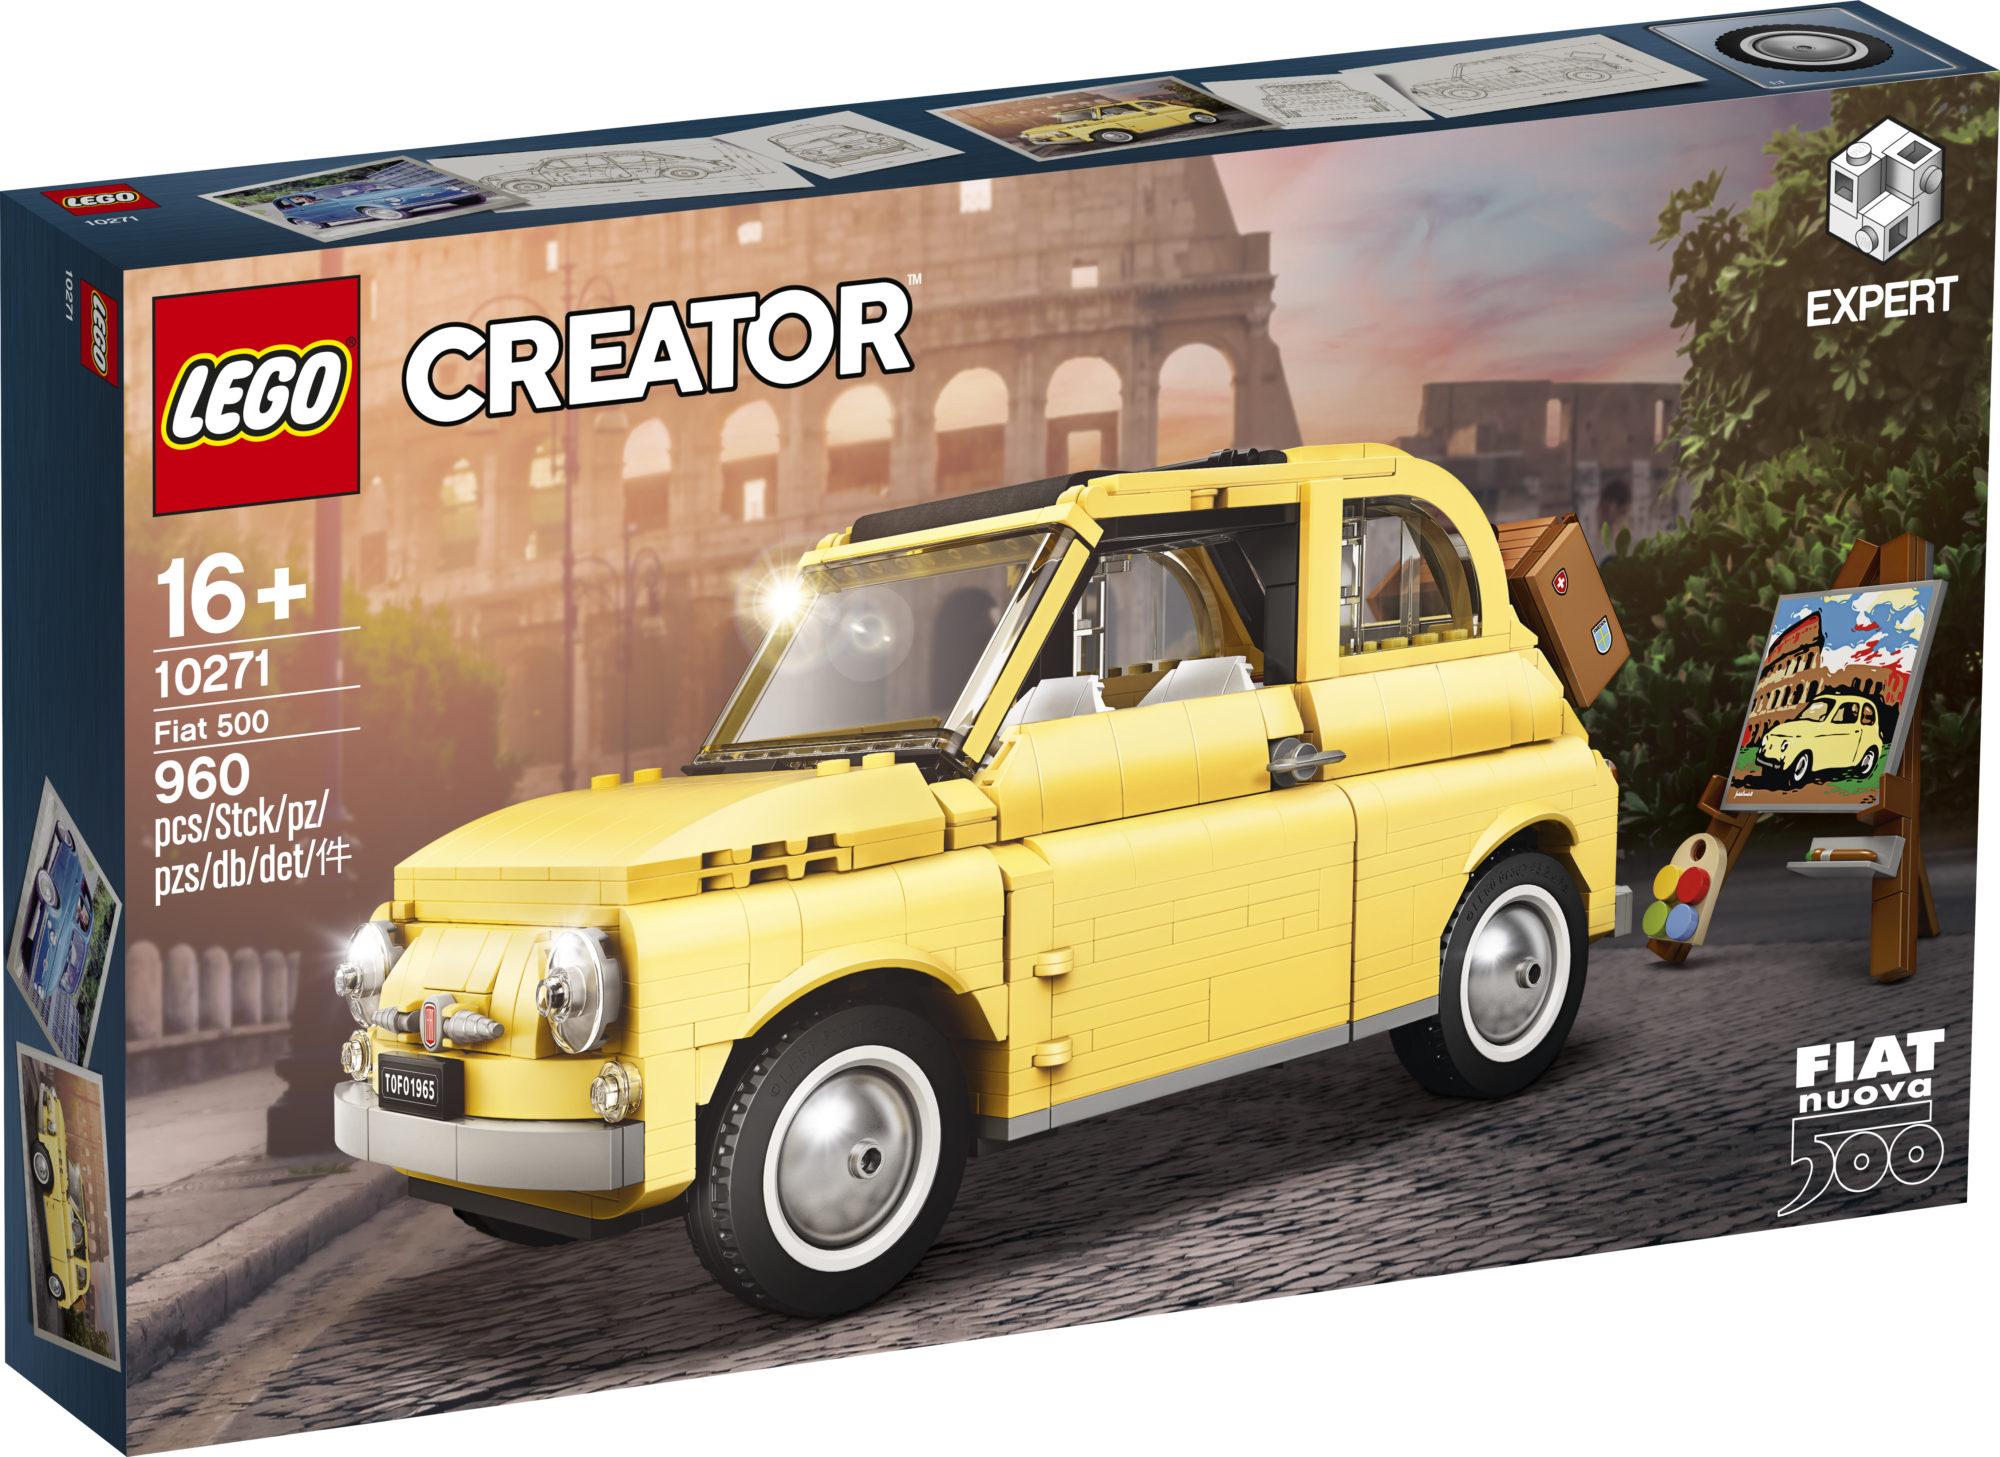 lego-10271-creator-expert-fiat-500-immagini-01